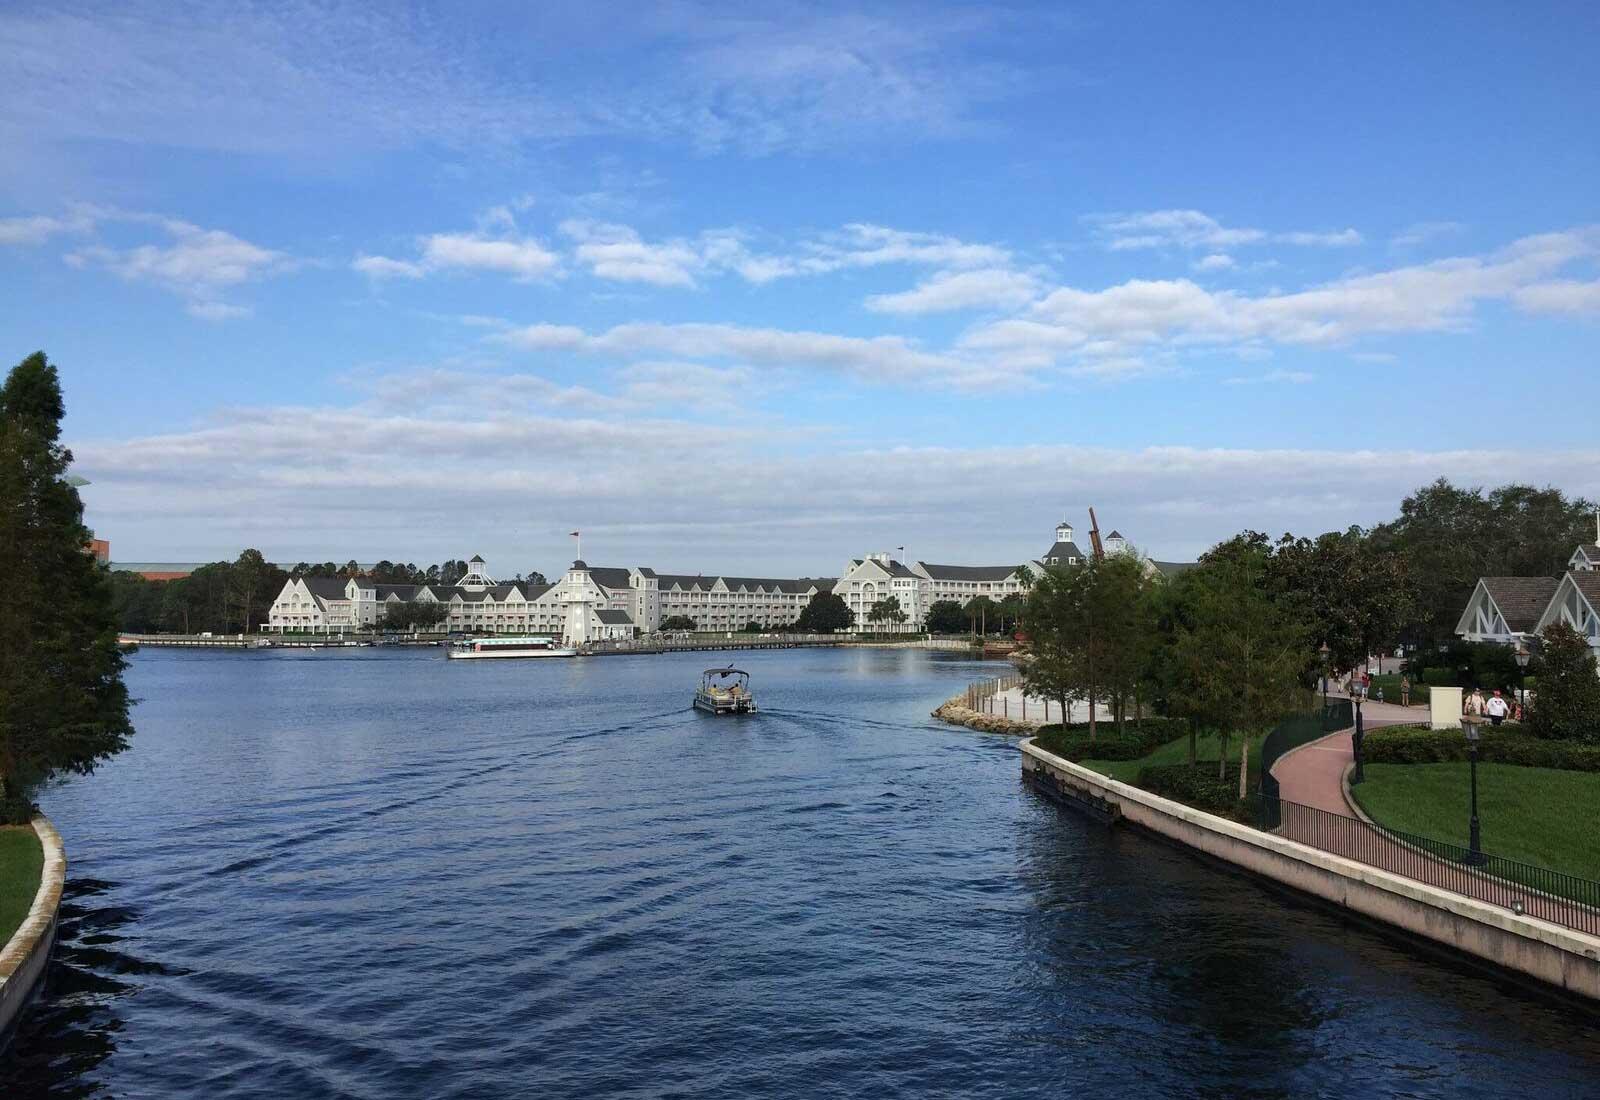 Hotels near Epcot - Boat Transportation